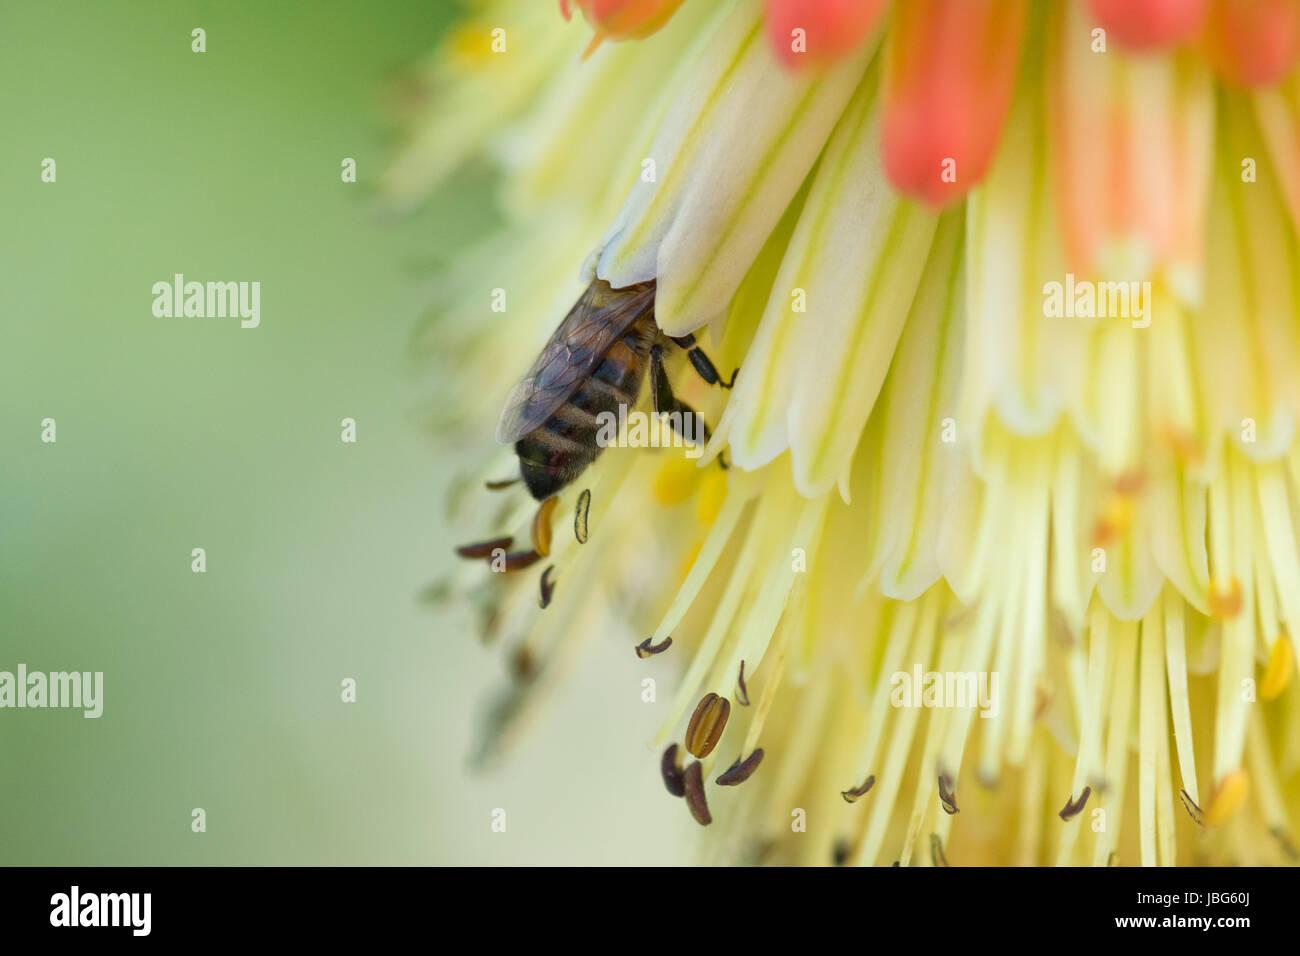 Abeja de miel Apis mellifera en flor de póker rojo caliente Foto de stock